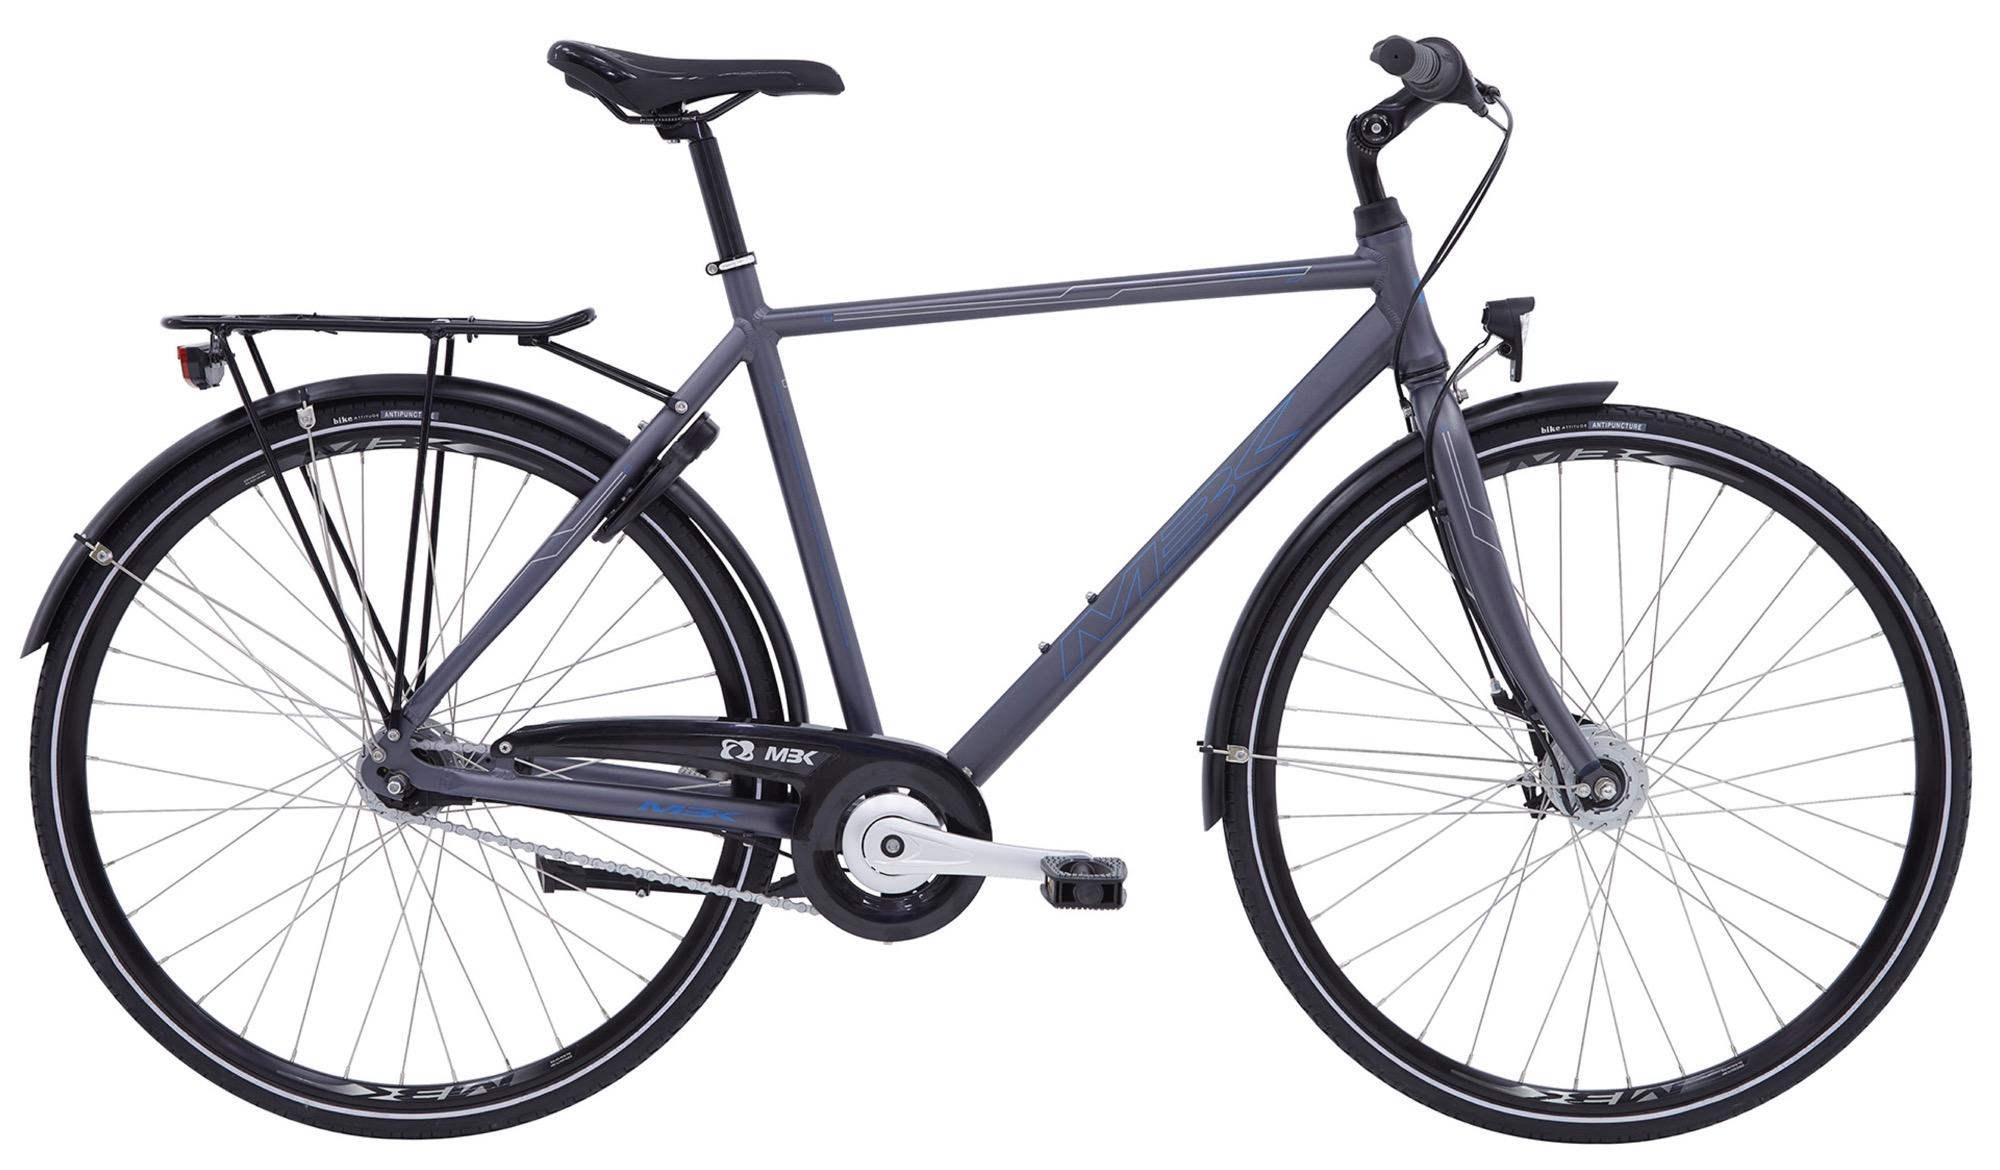 Pedalatleten Mbk Smogbuster 2 Herre 7 Gear Mat Gråblå - 2020 Cykler||Mbk Cykler